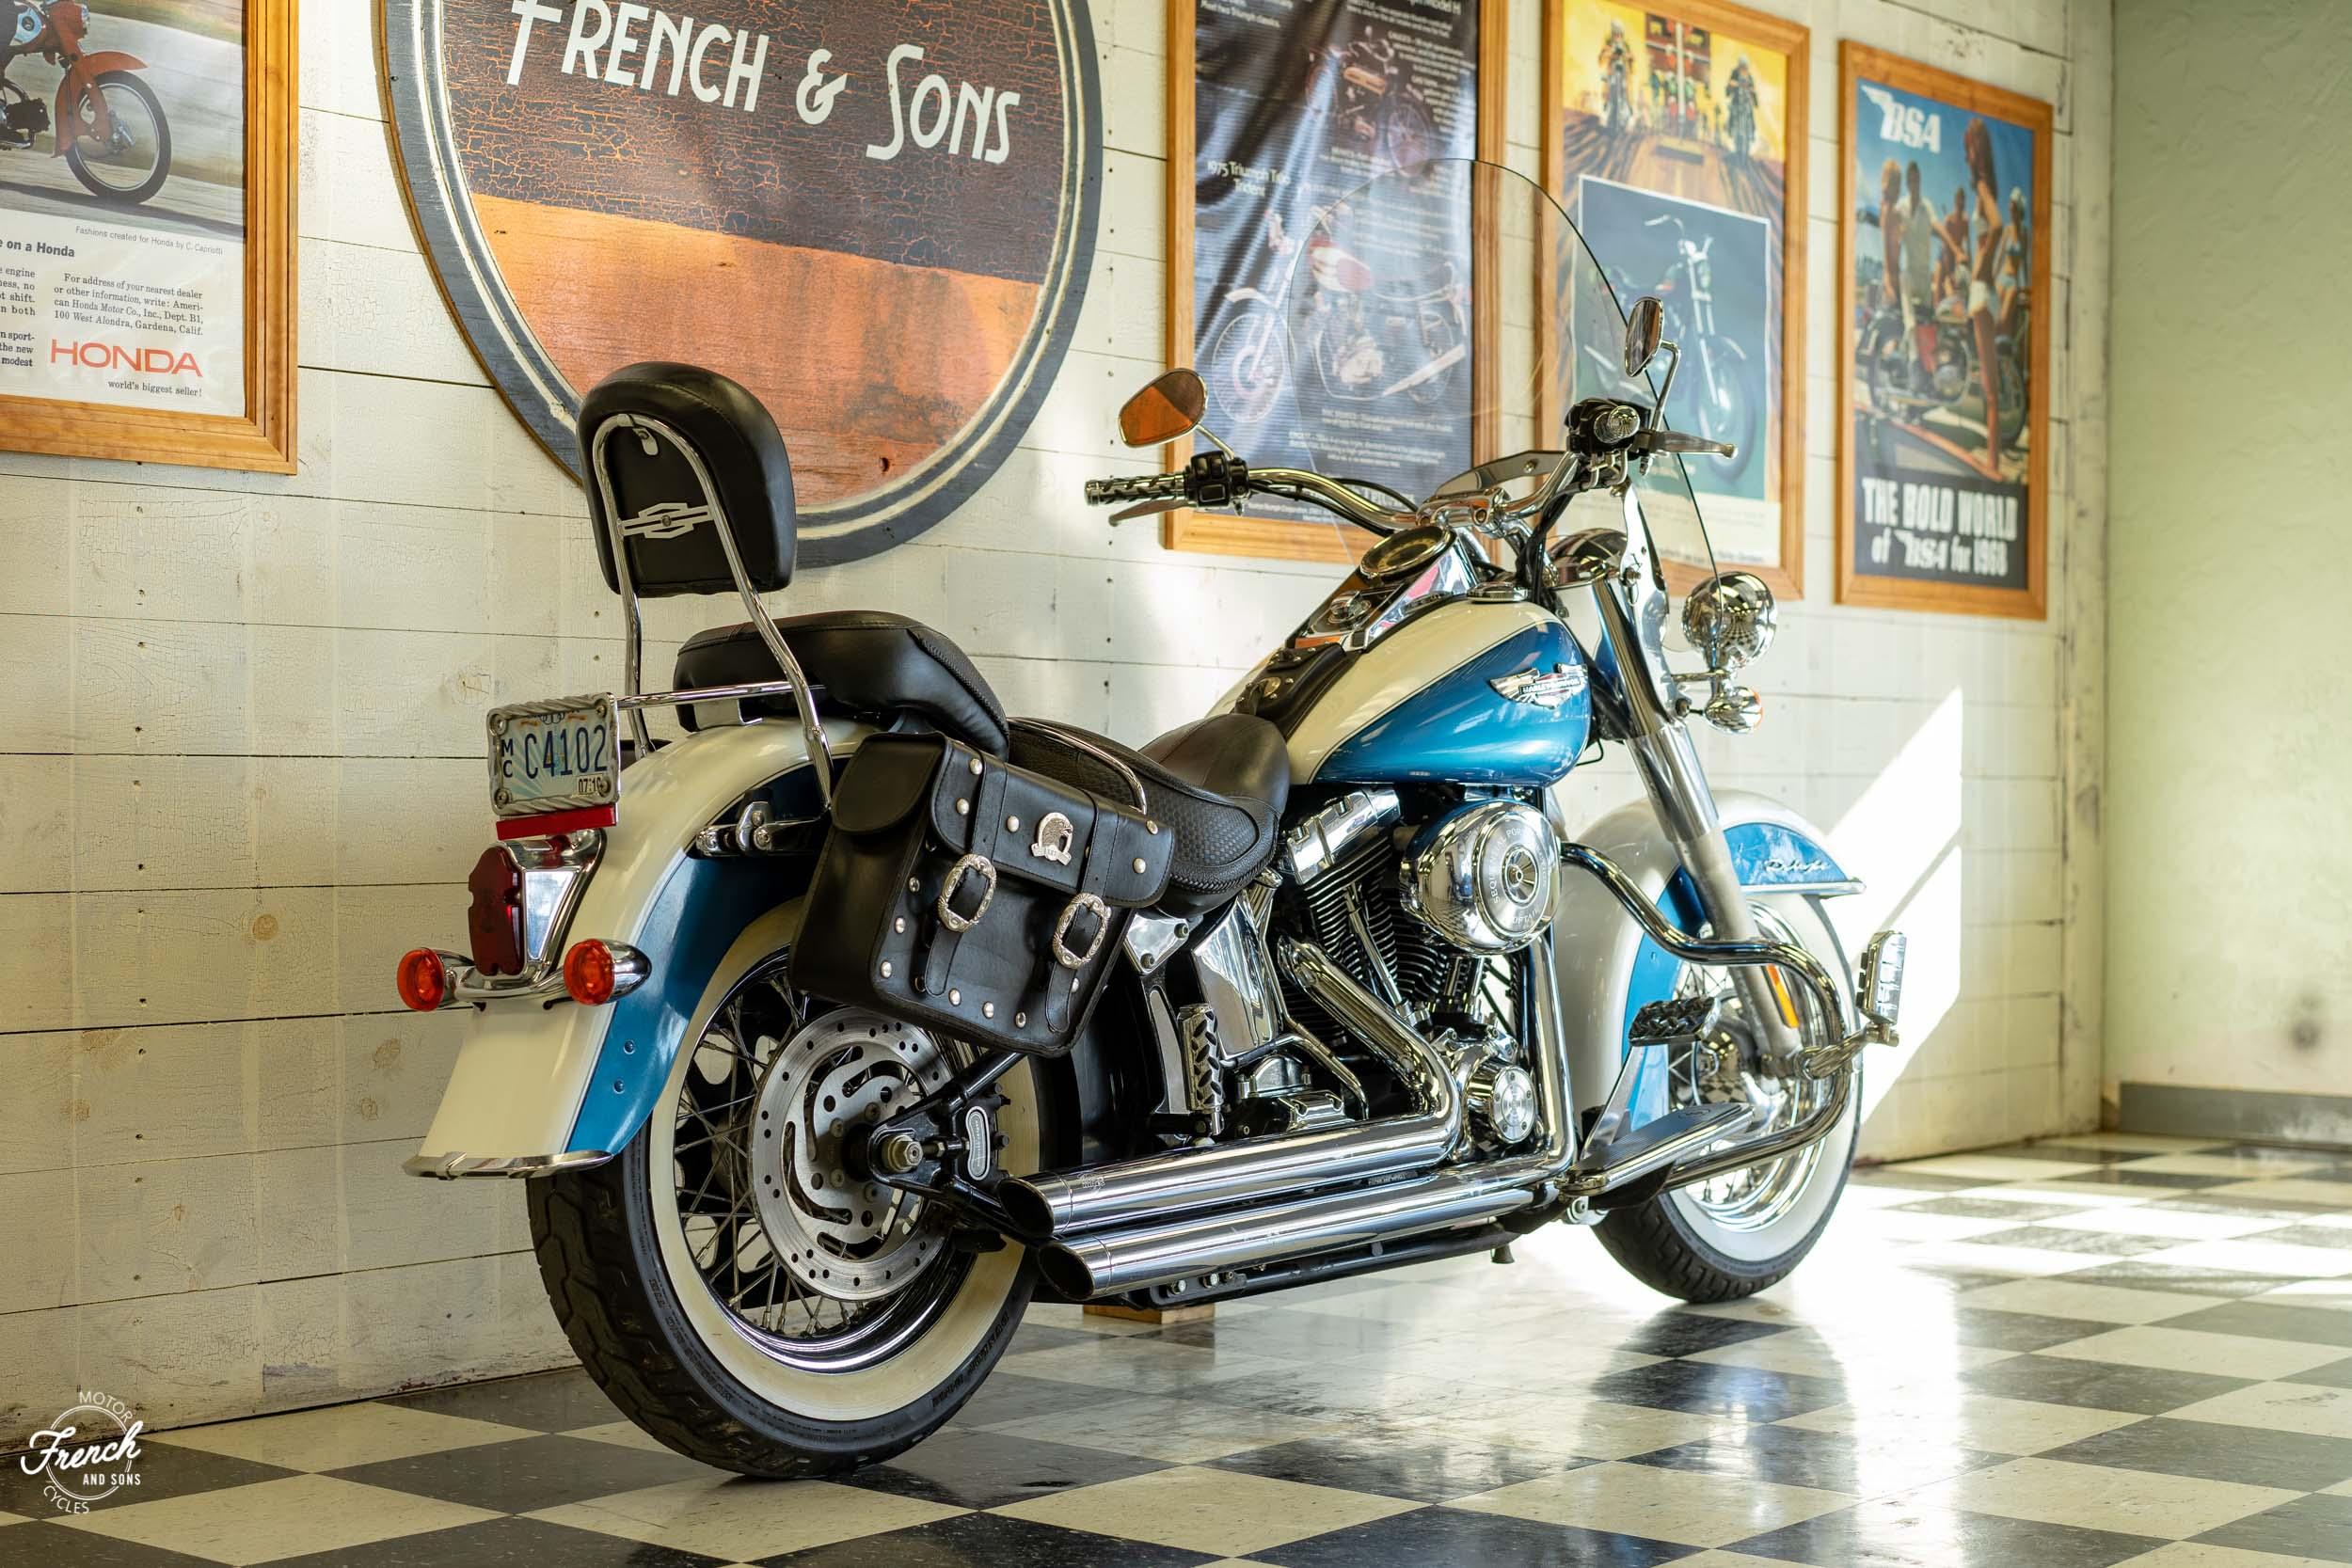 2005_Harley_Davidson_Softail_Deluxe-7.jpg